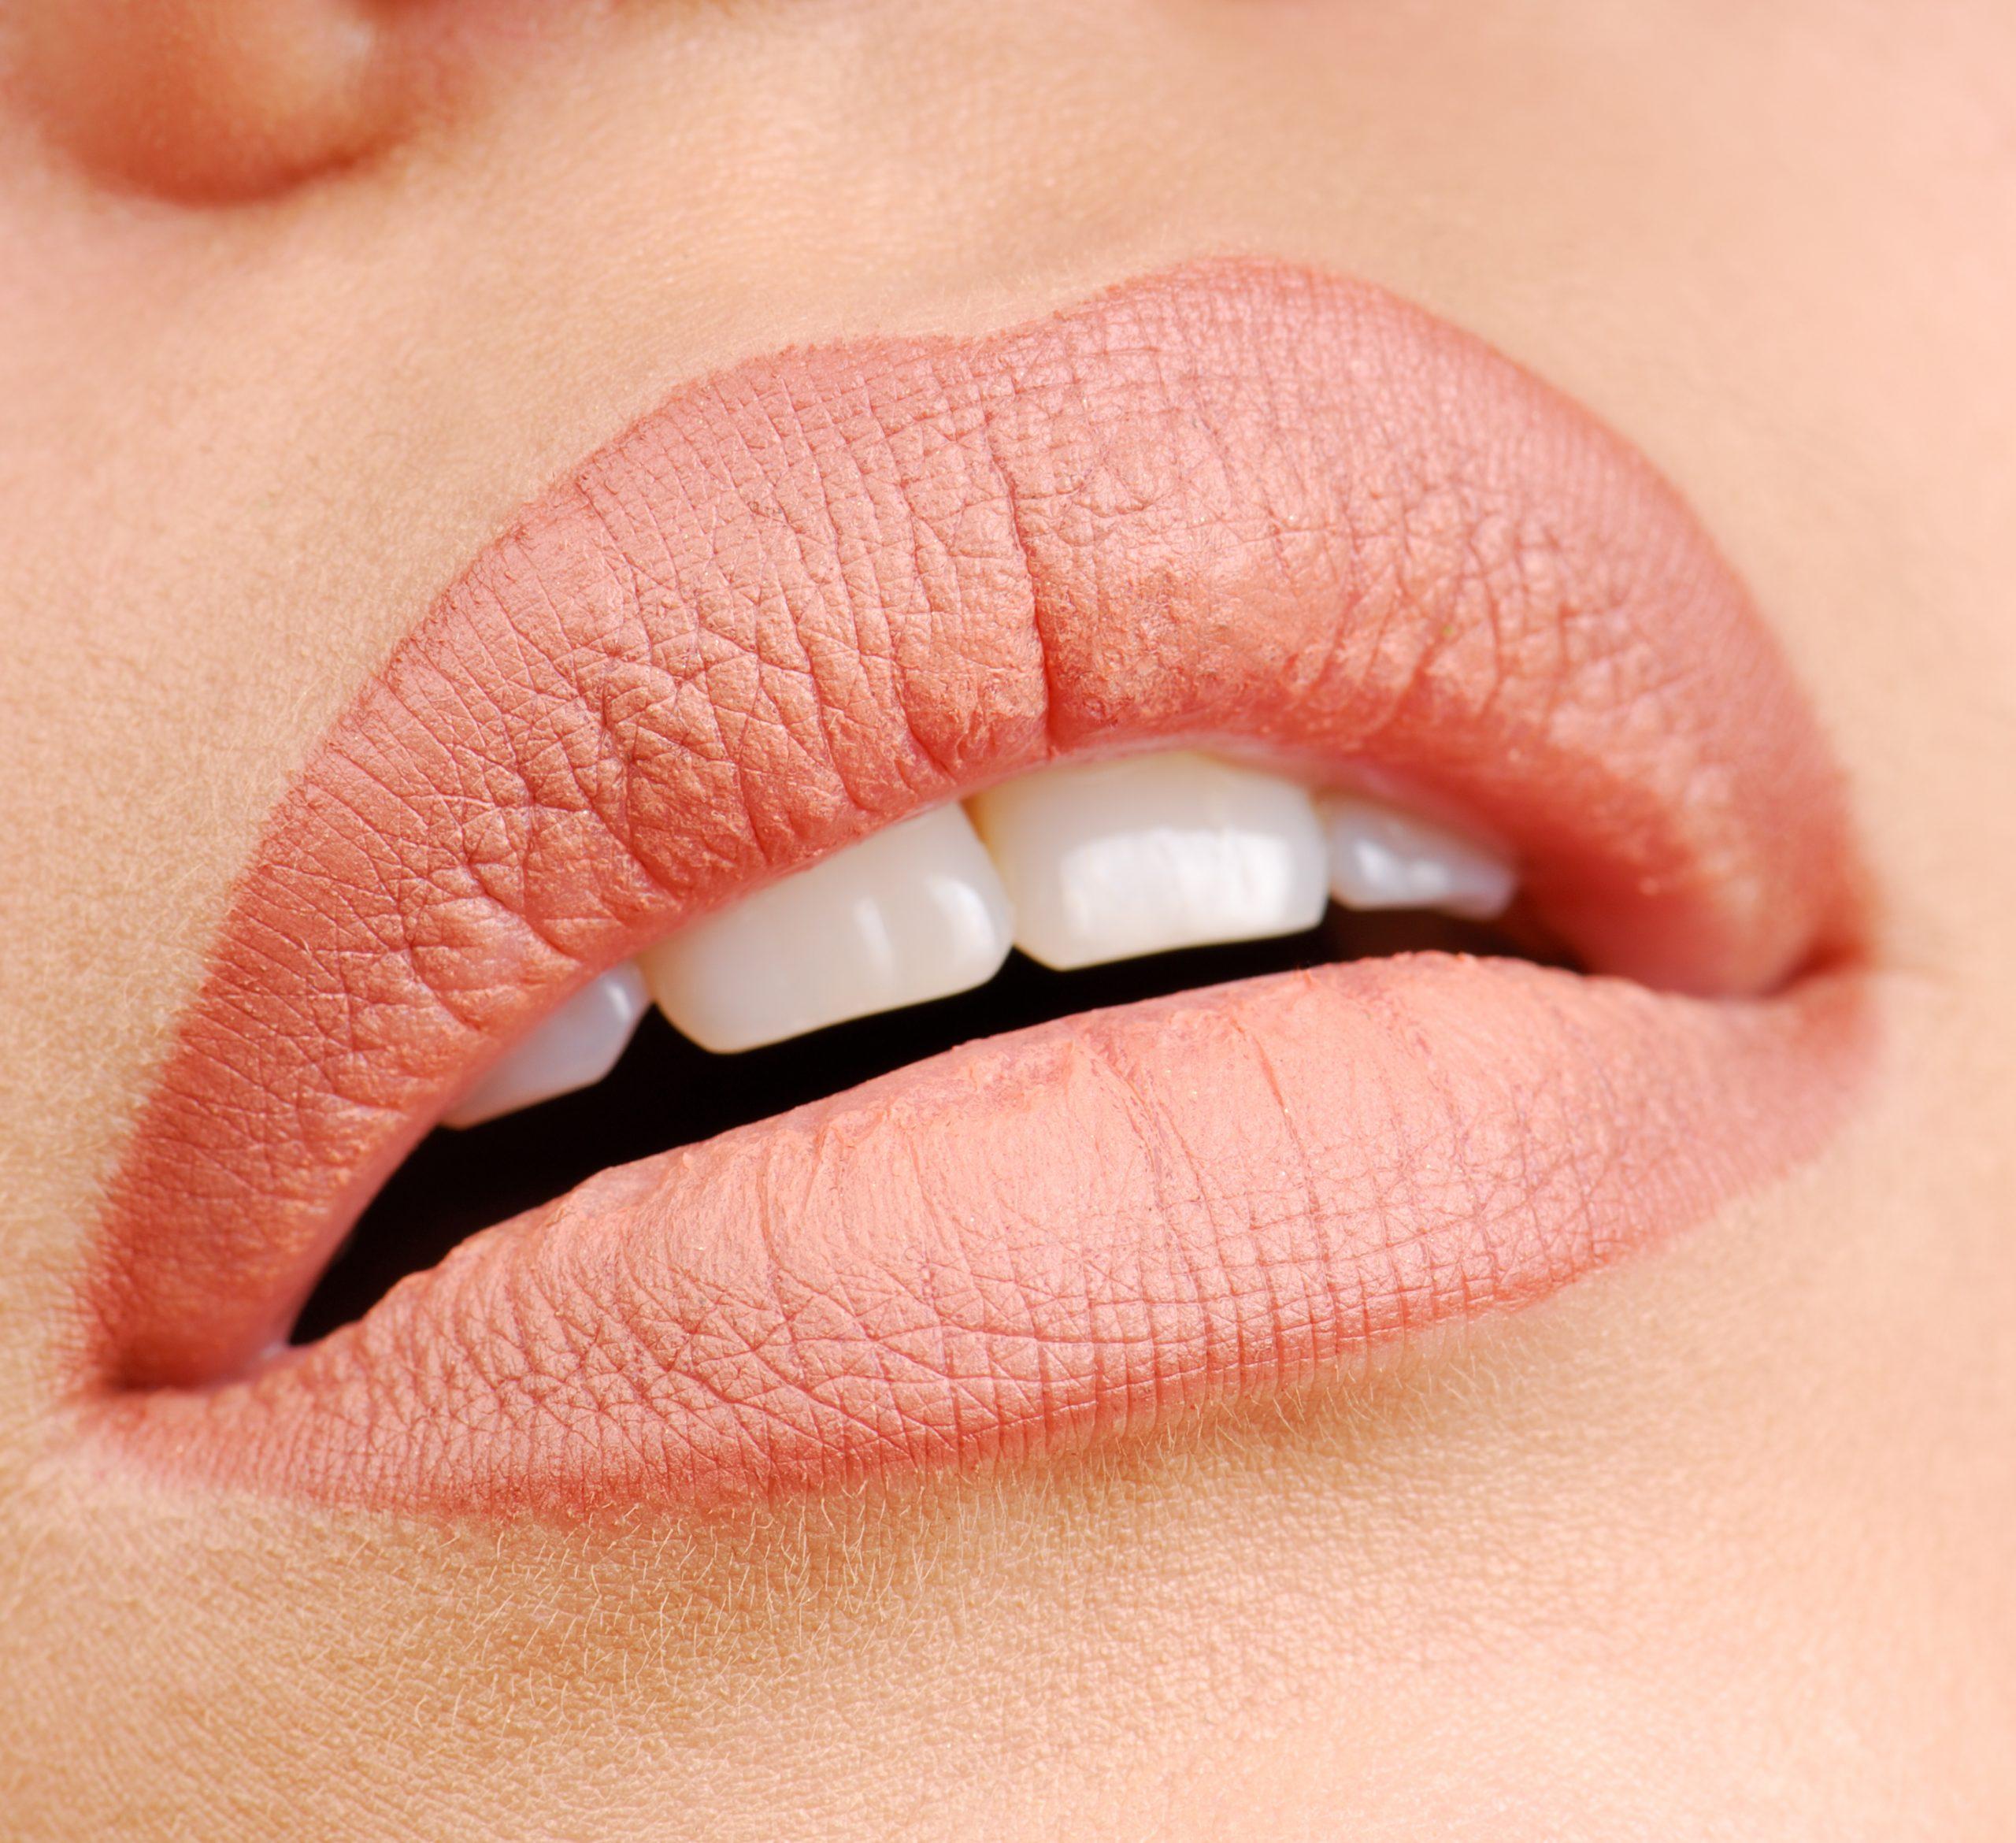 bibir kering